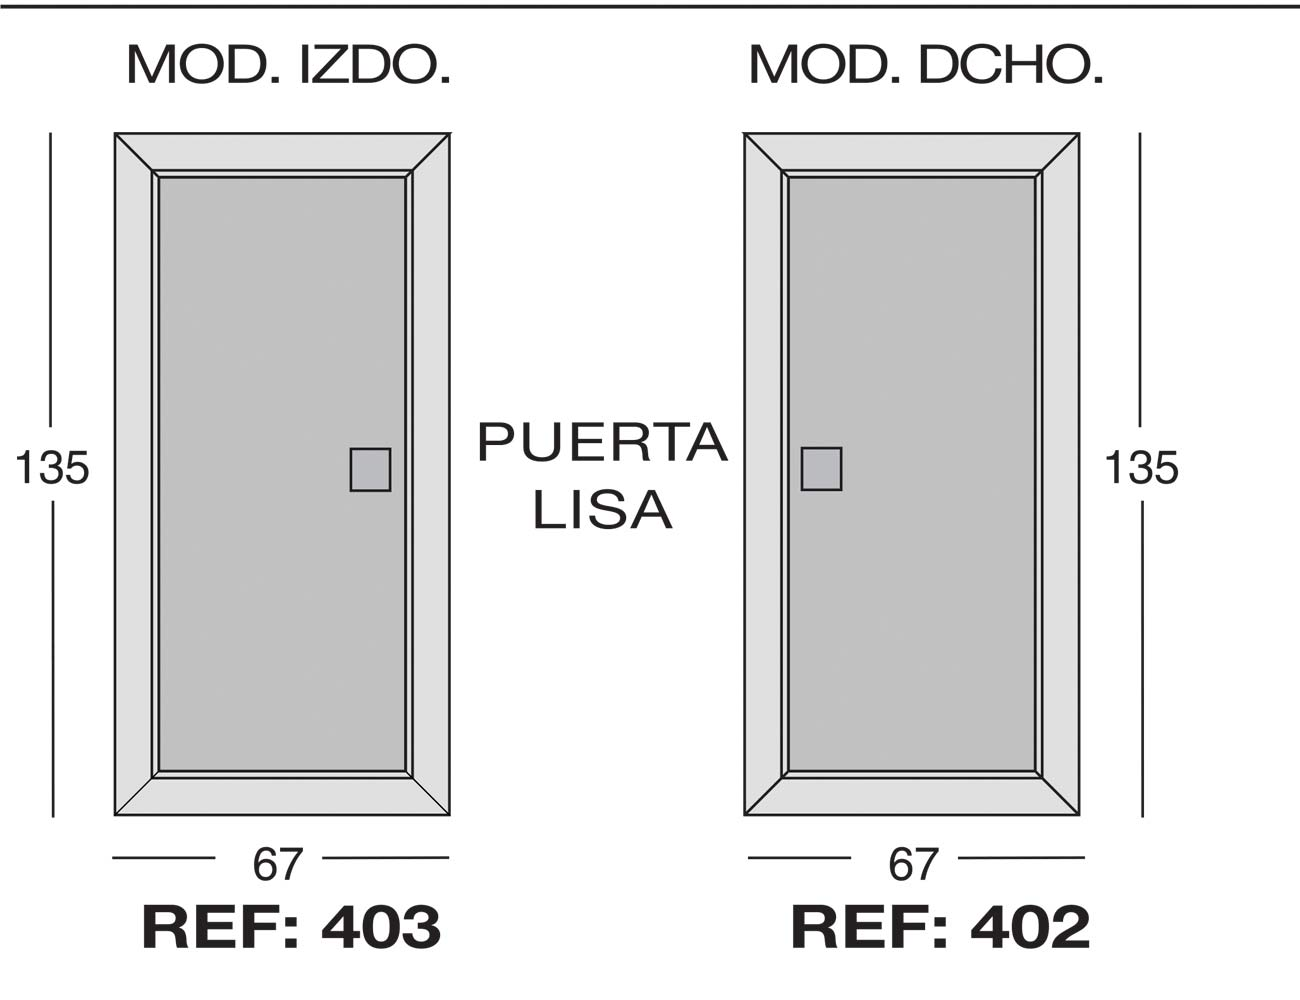 Modulo izdo 403 dcho 4021